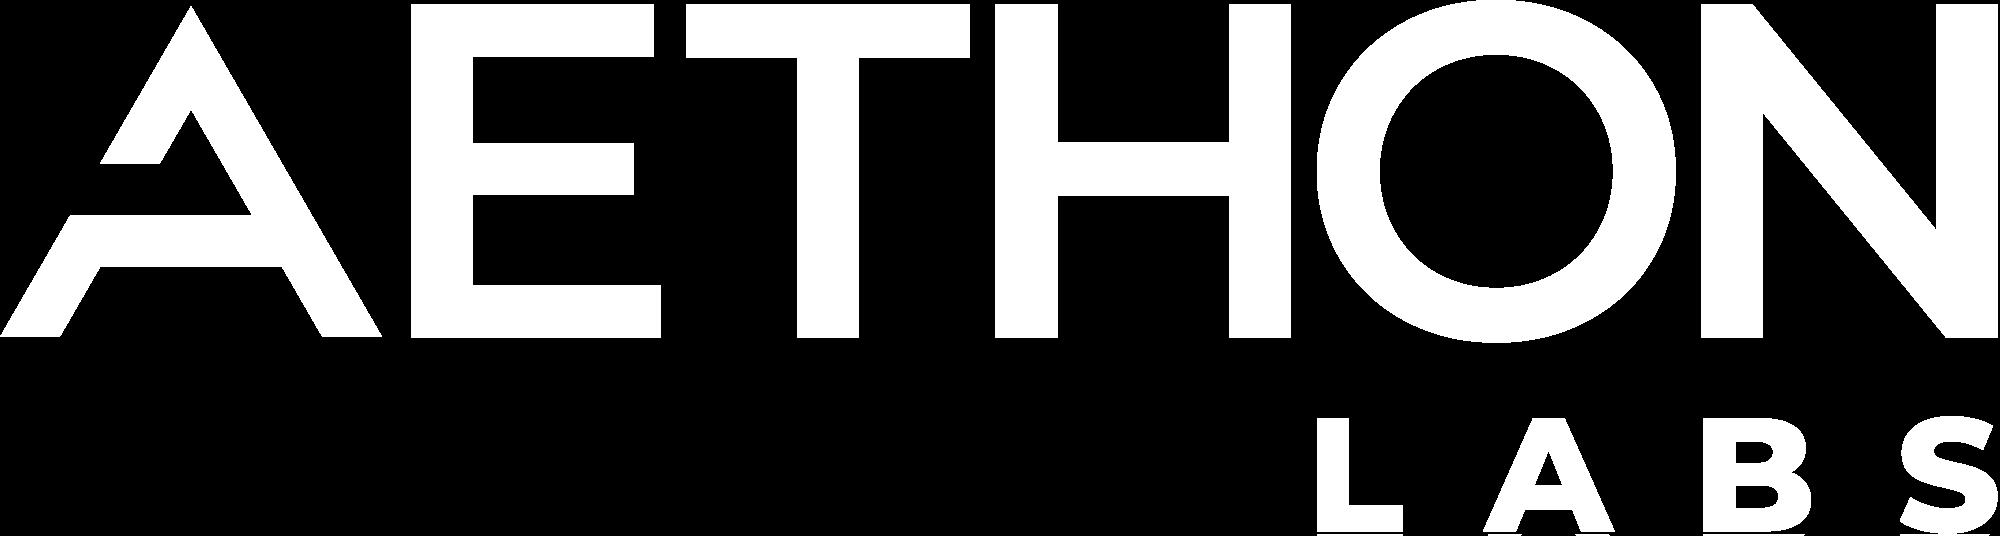 Aethon Labs